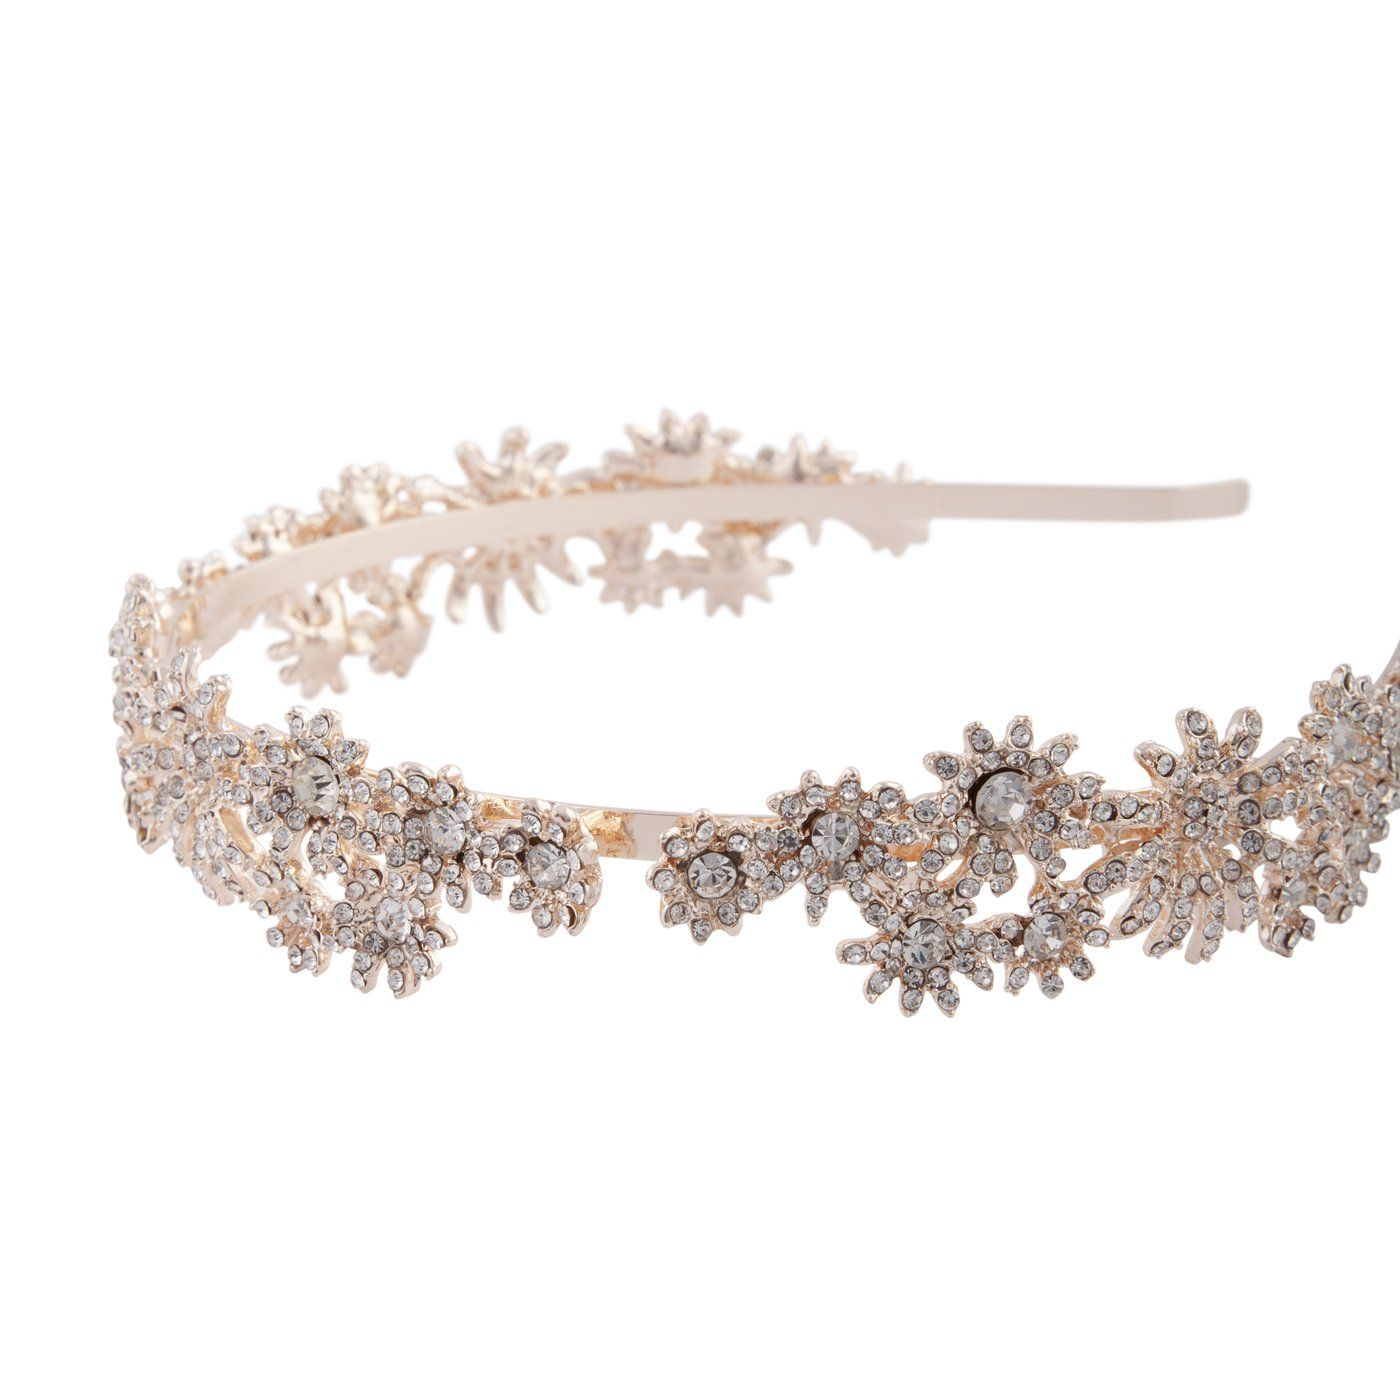 Headband Alice Band Bridesmaid B Diamante Flower /& Pearls Bridal Hair Band